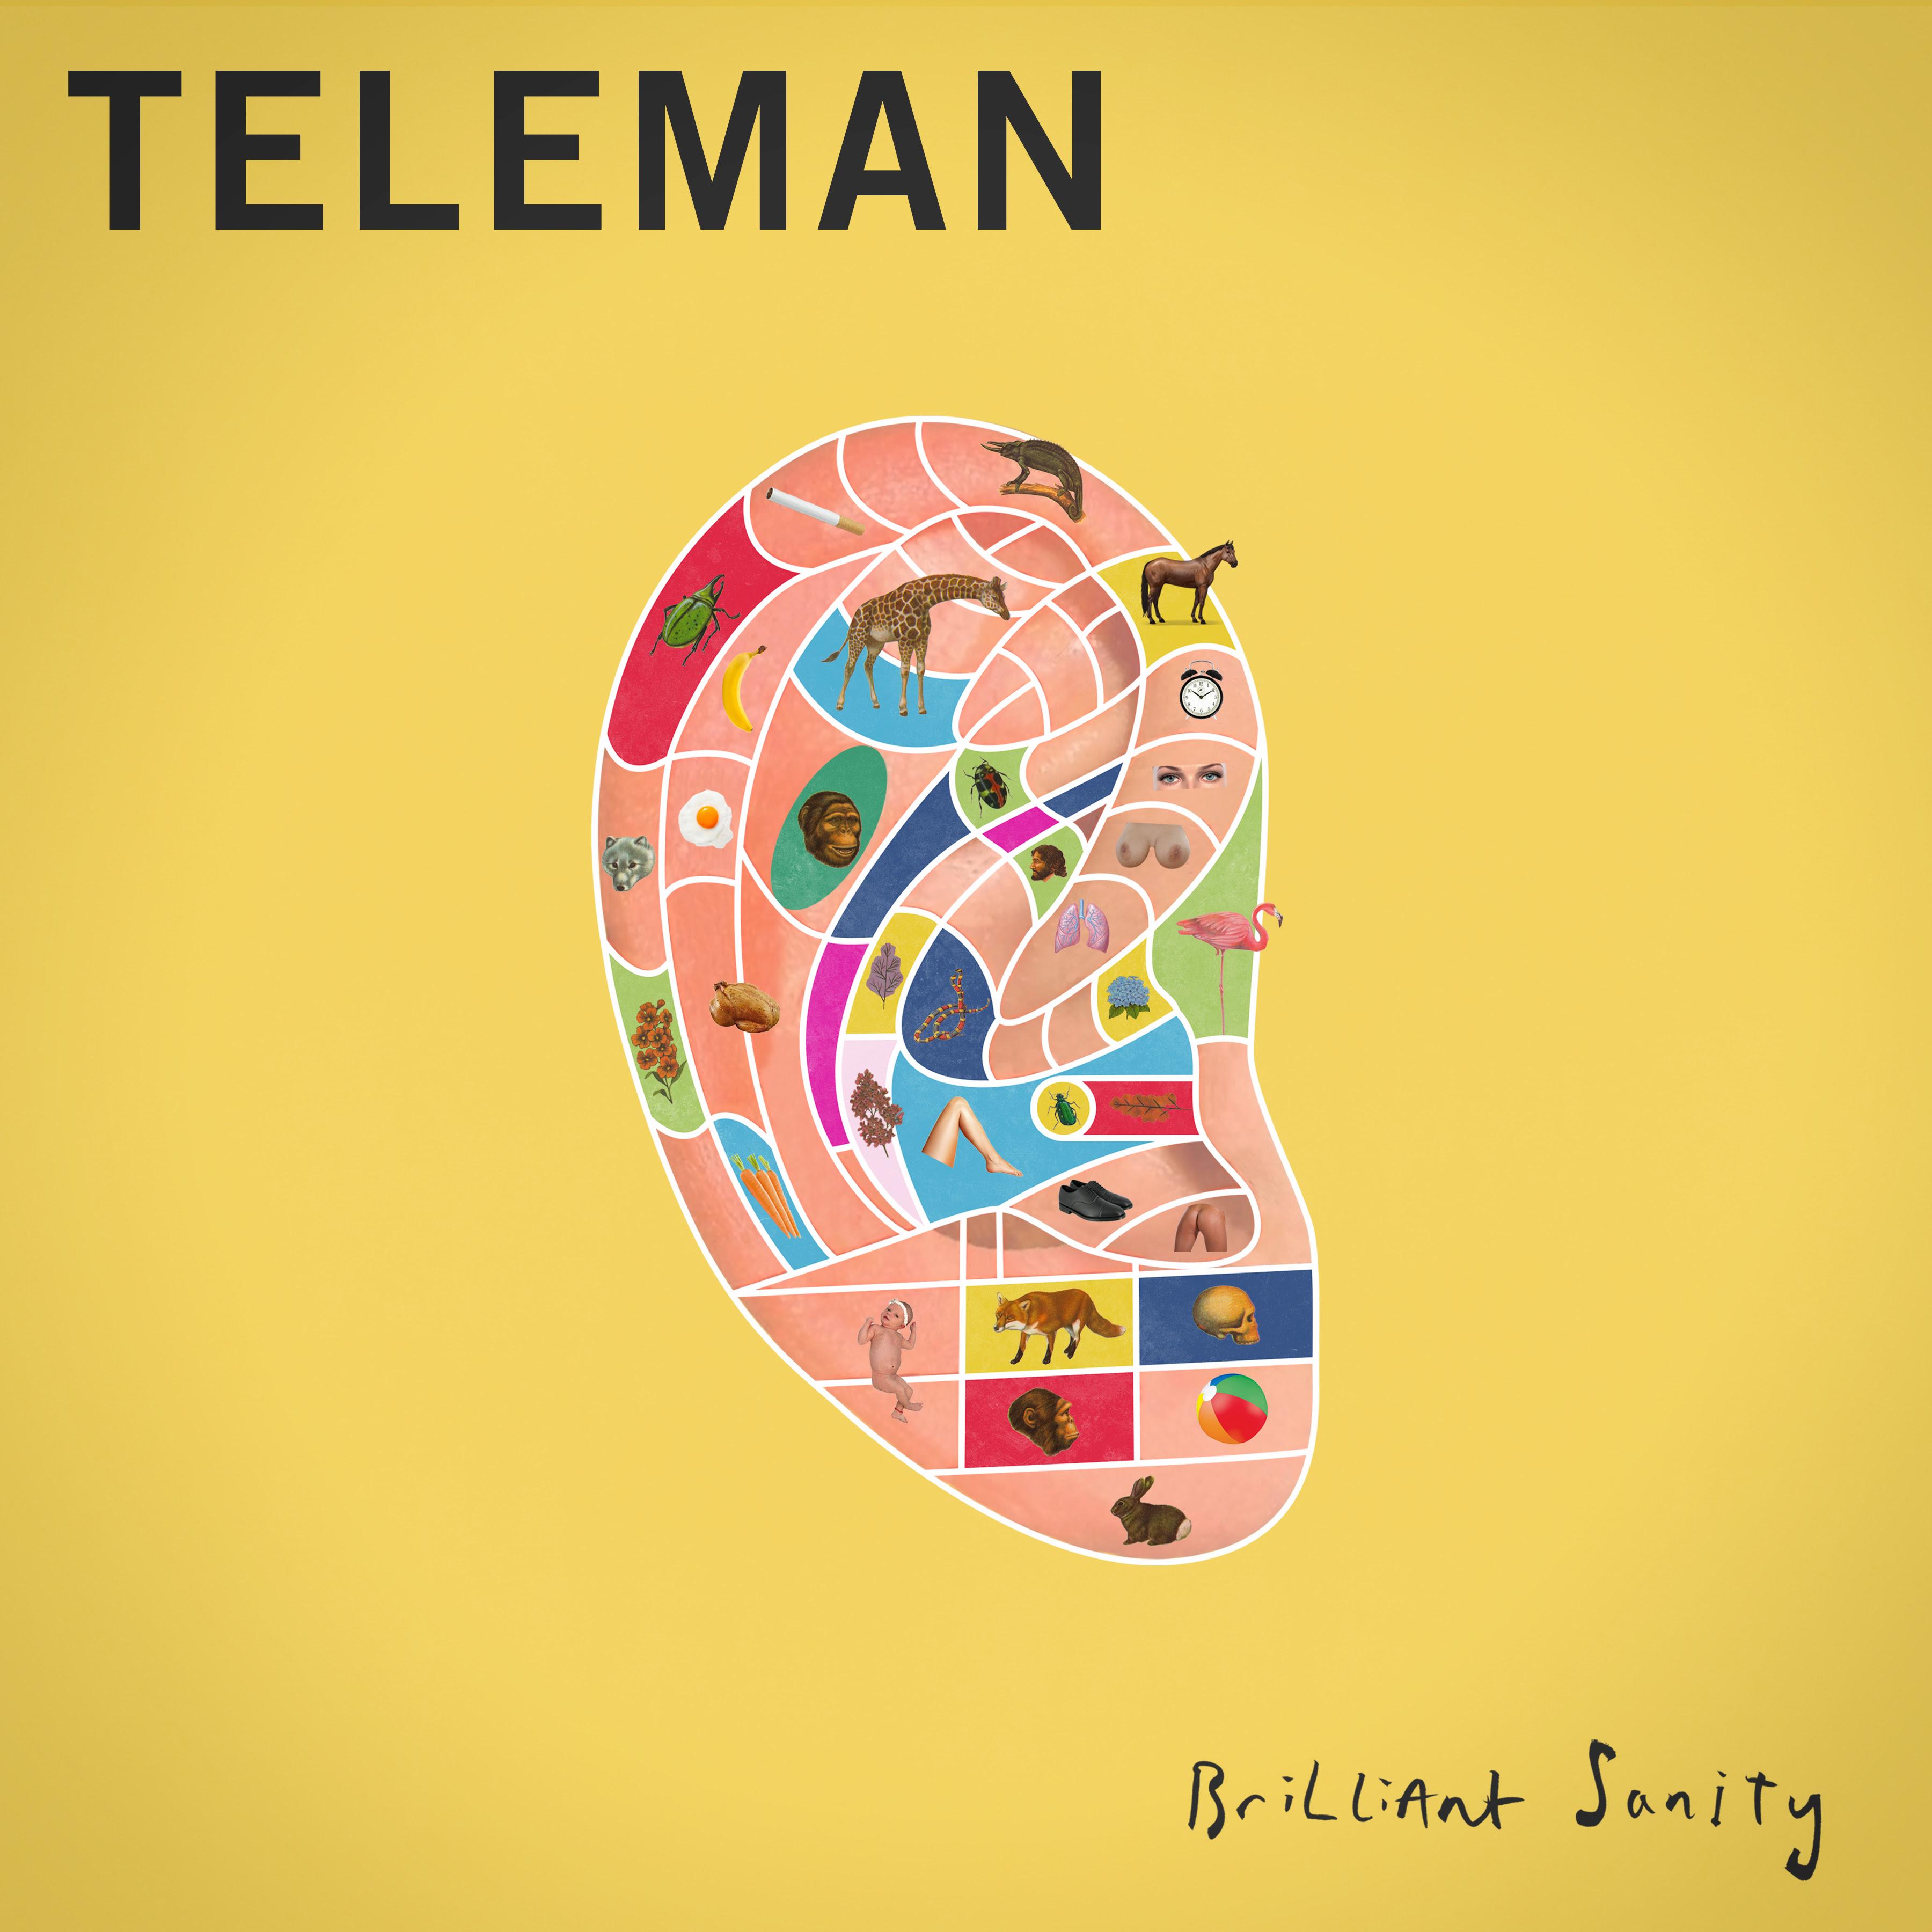 Teleman